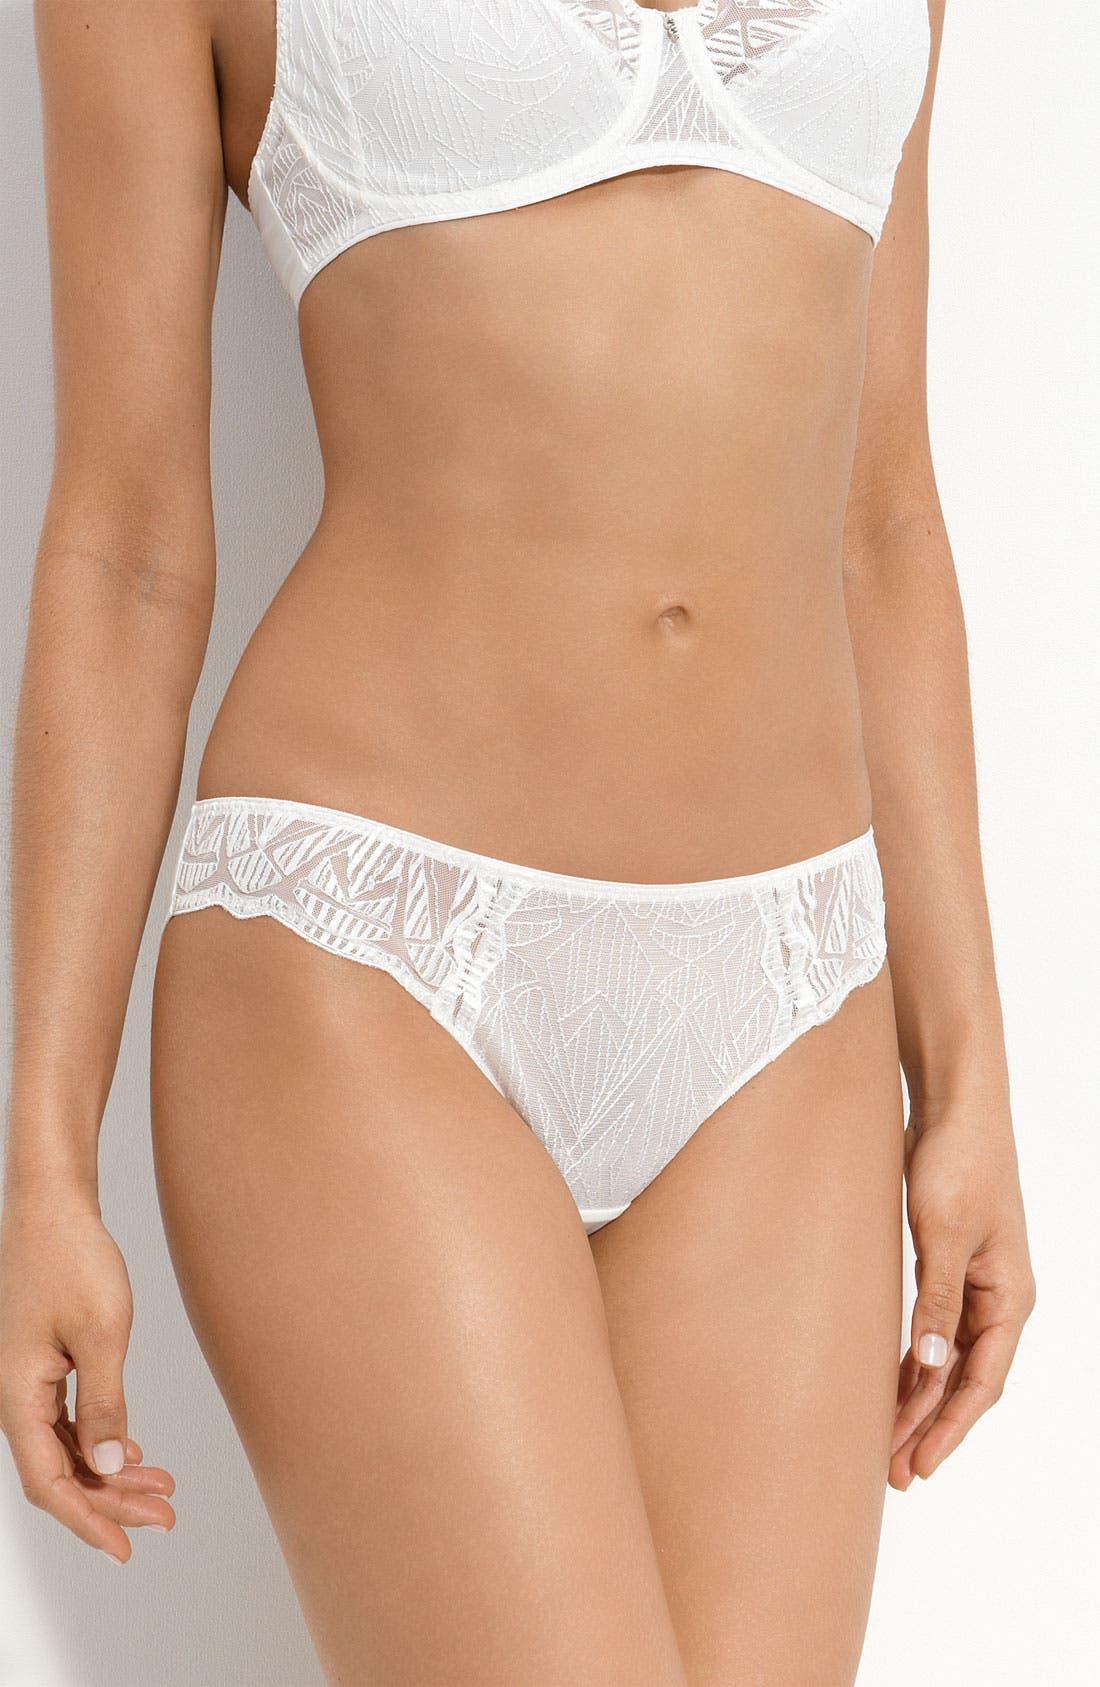 Main Image - Chantelle Intimates 'Fascination' Bikini